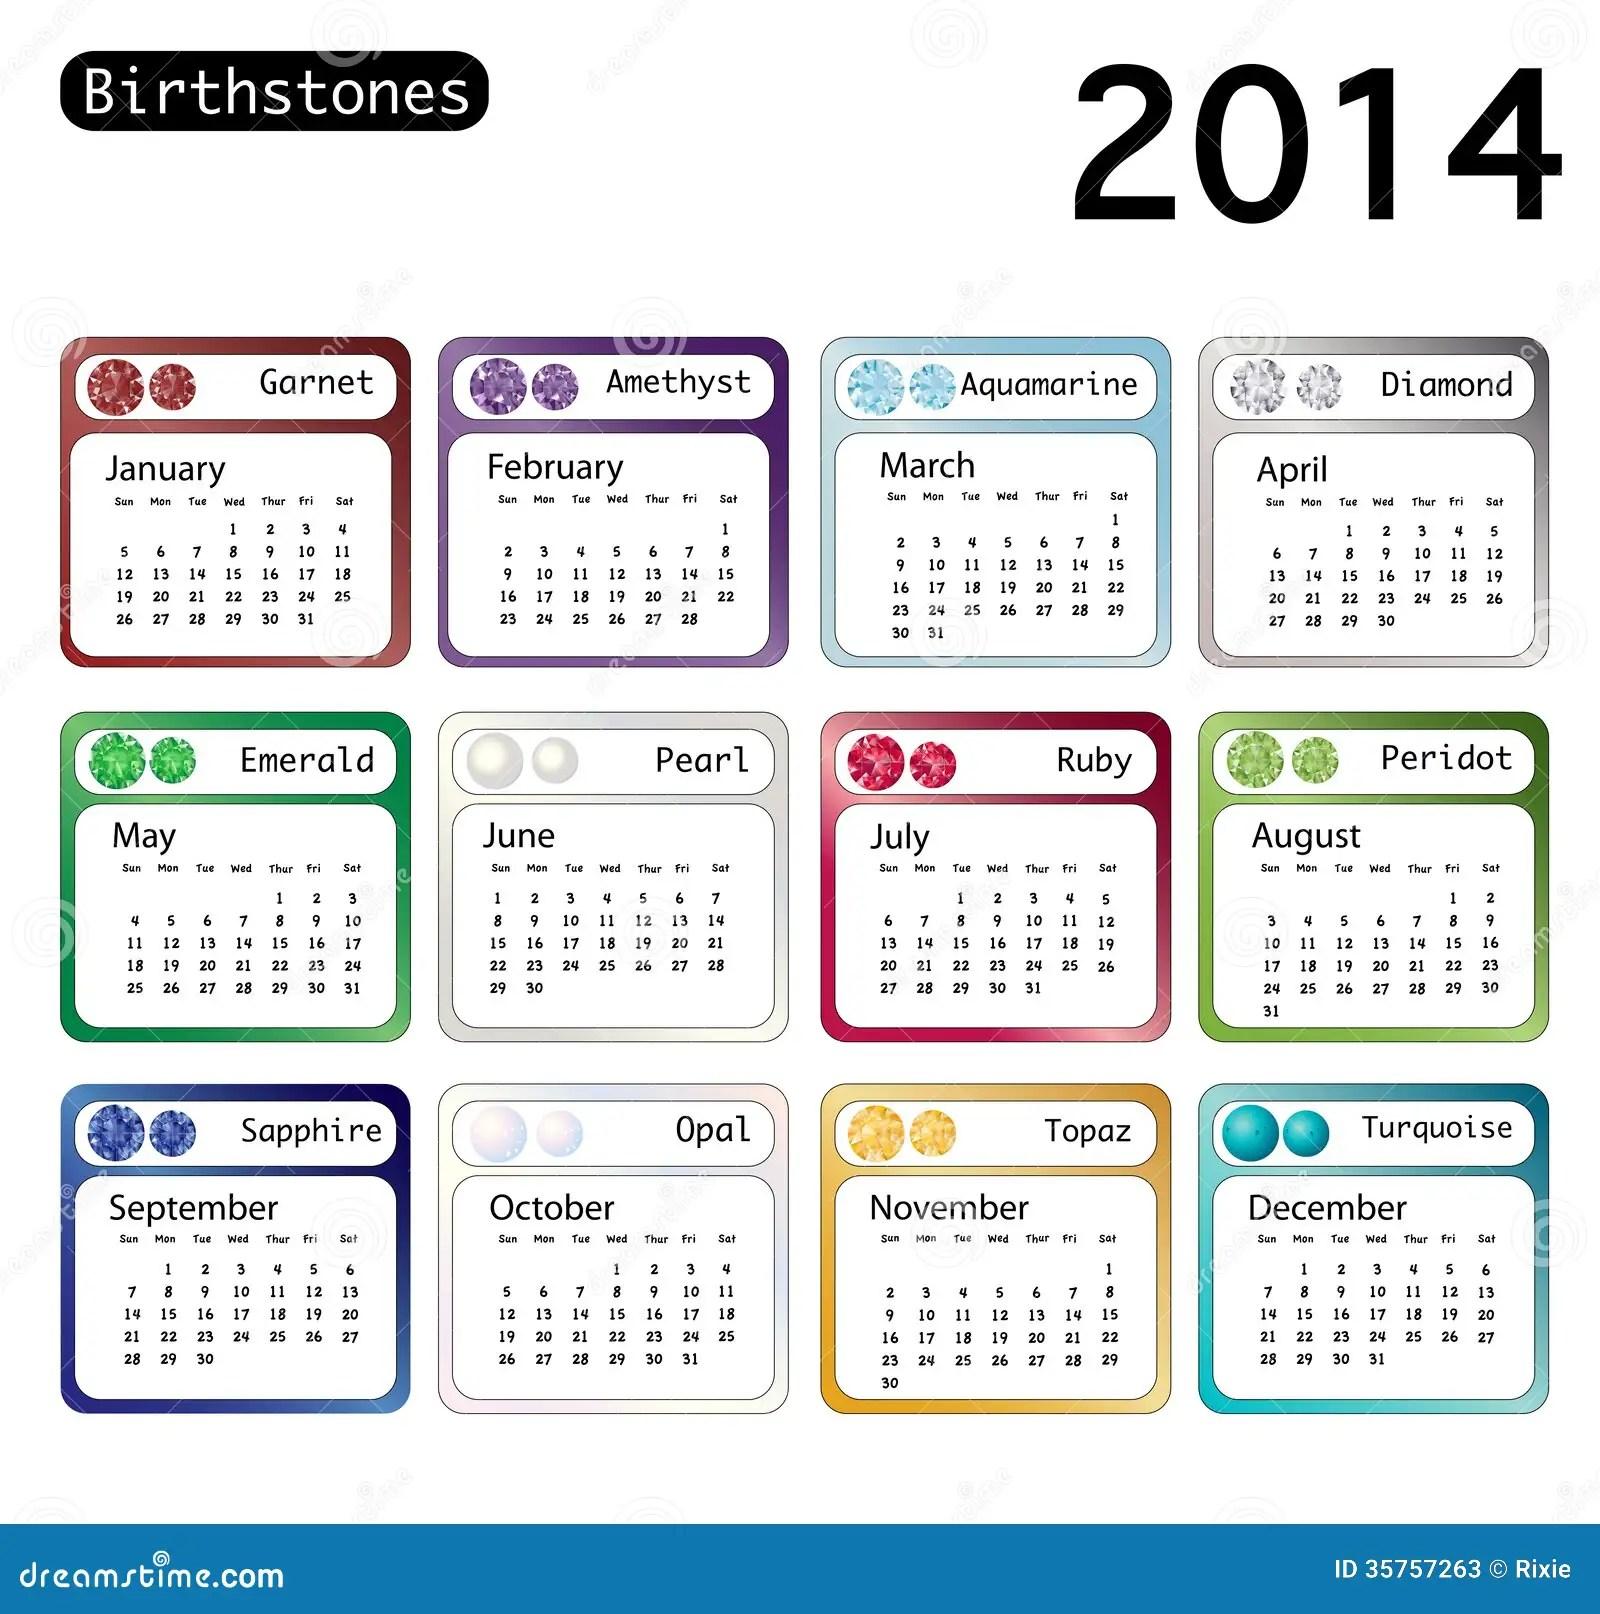 Birthstone Calendar 2014 Stock Illustration Image Of